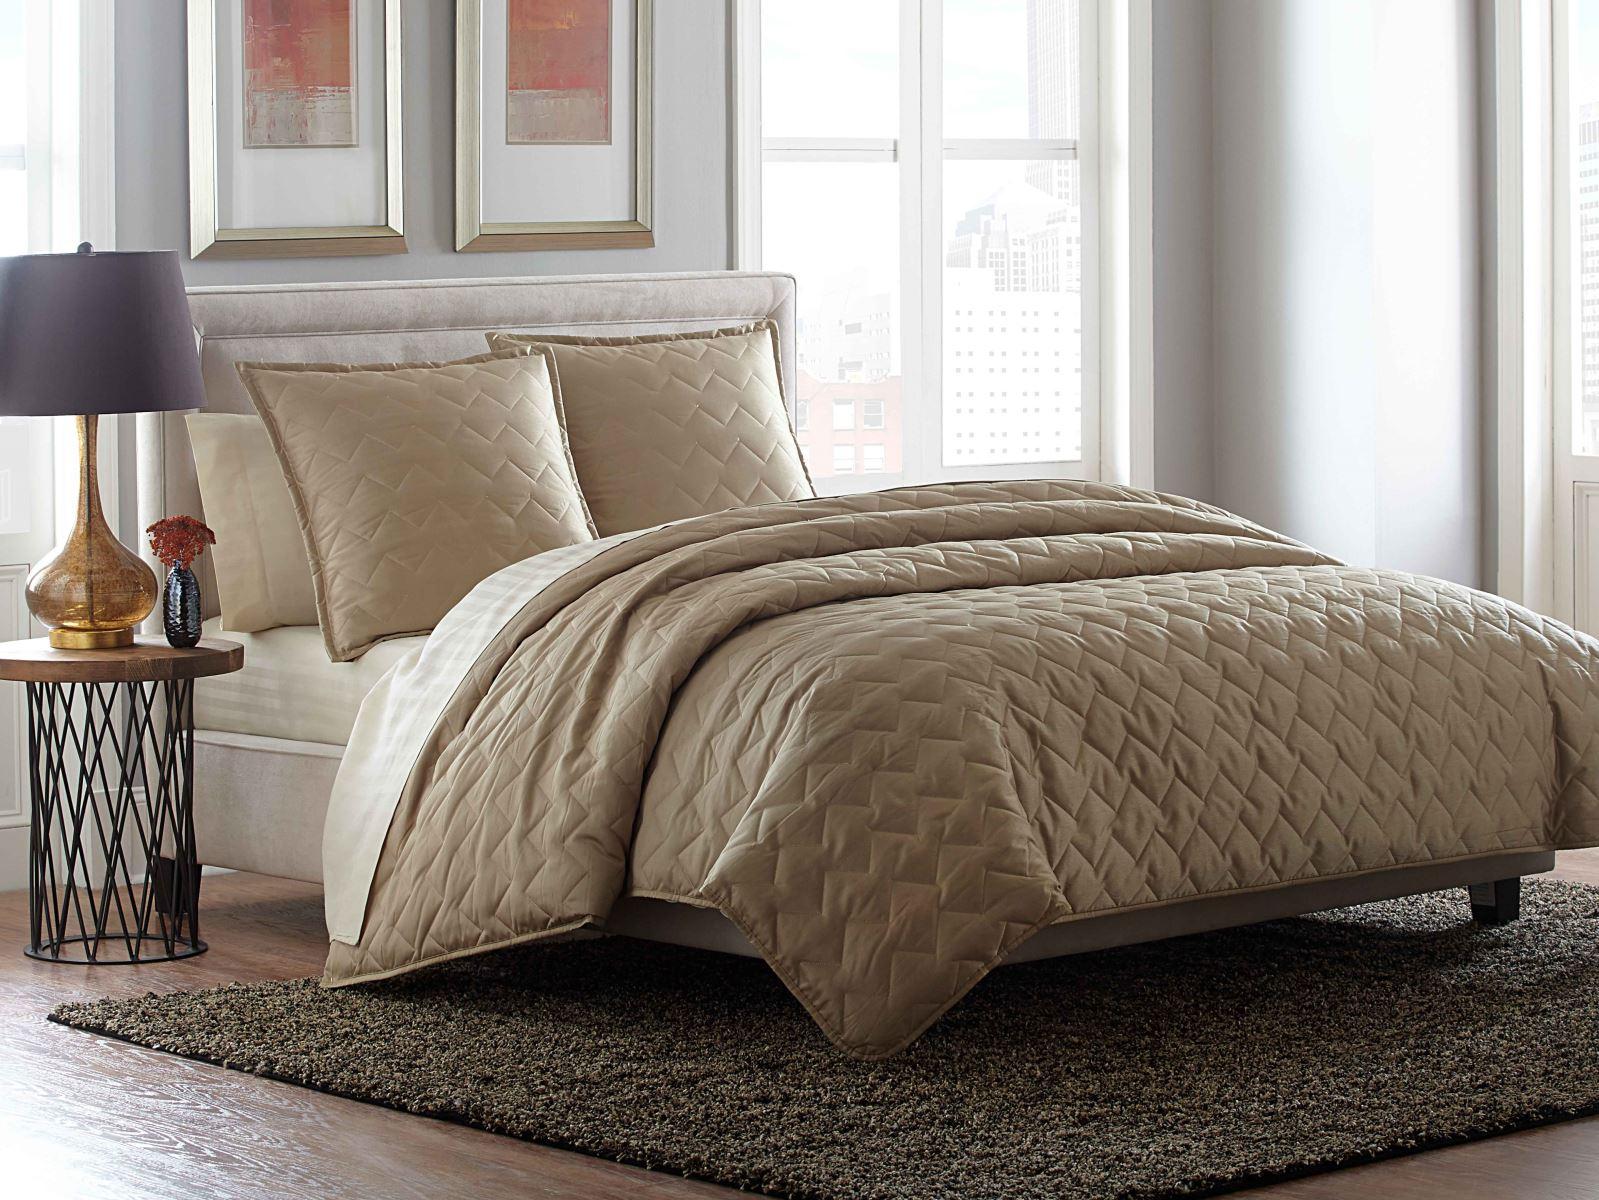 cosmopolitan 3pc bedding set by aico